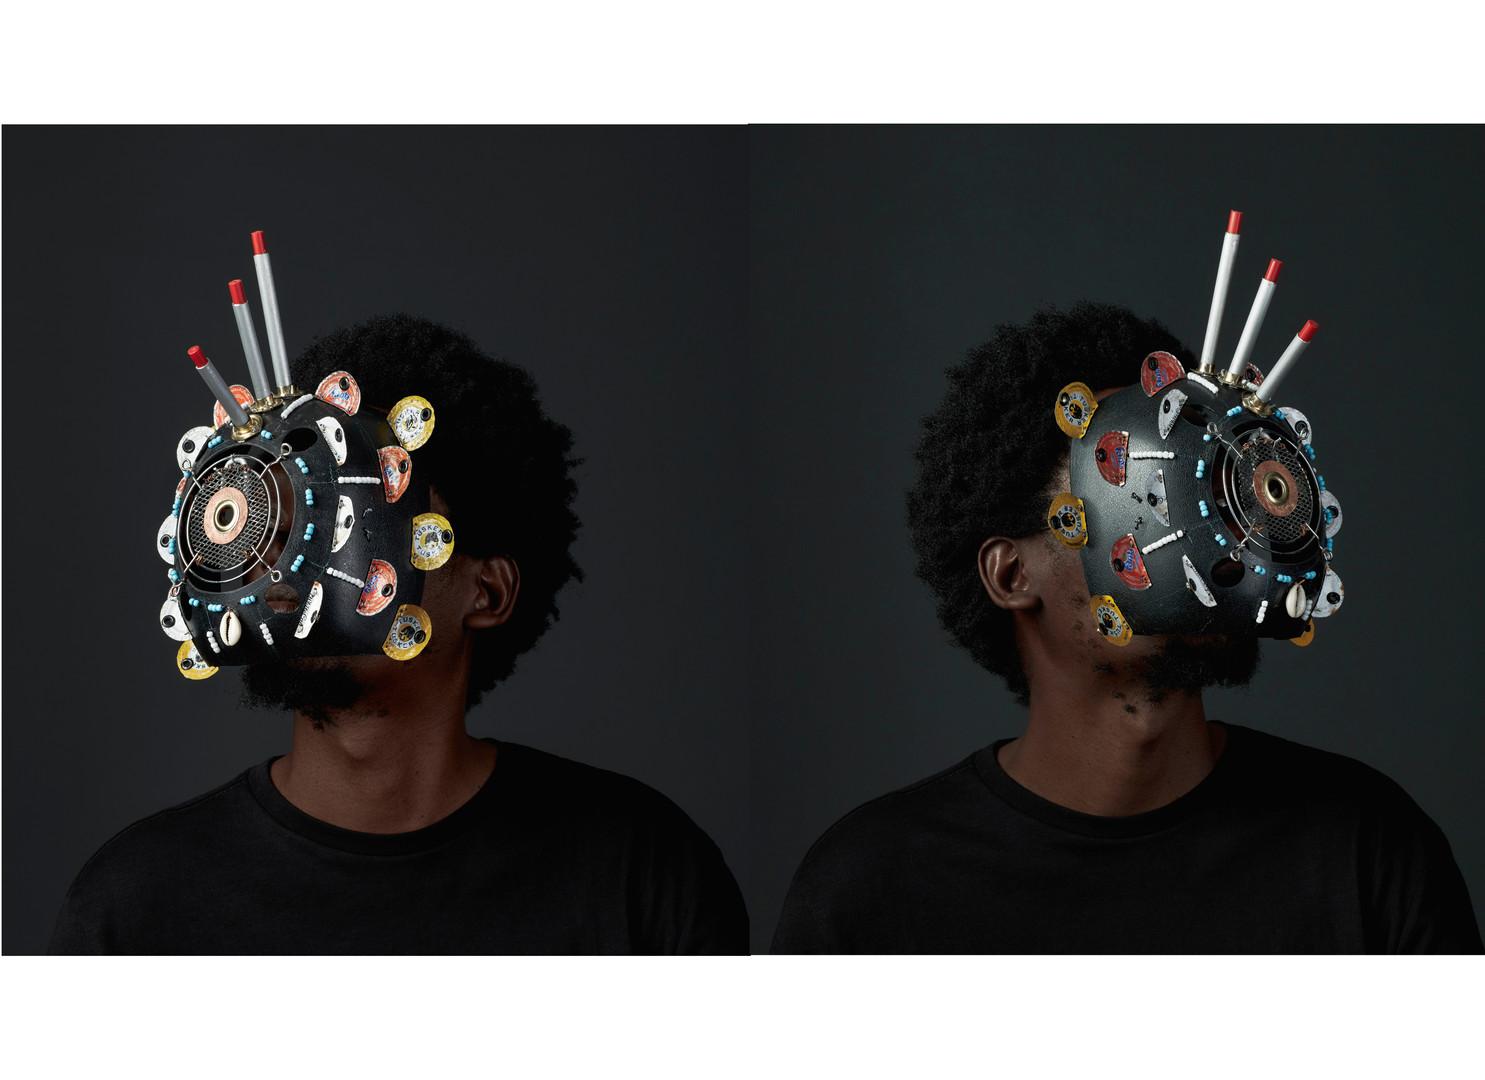 Cyrus Kabiru | Macho Nne The Black Magic (Diptych) | 2018 | C-Type Print on Diasec Mount | 100 x 90 cm Each | Edition of 1 + 2 AP